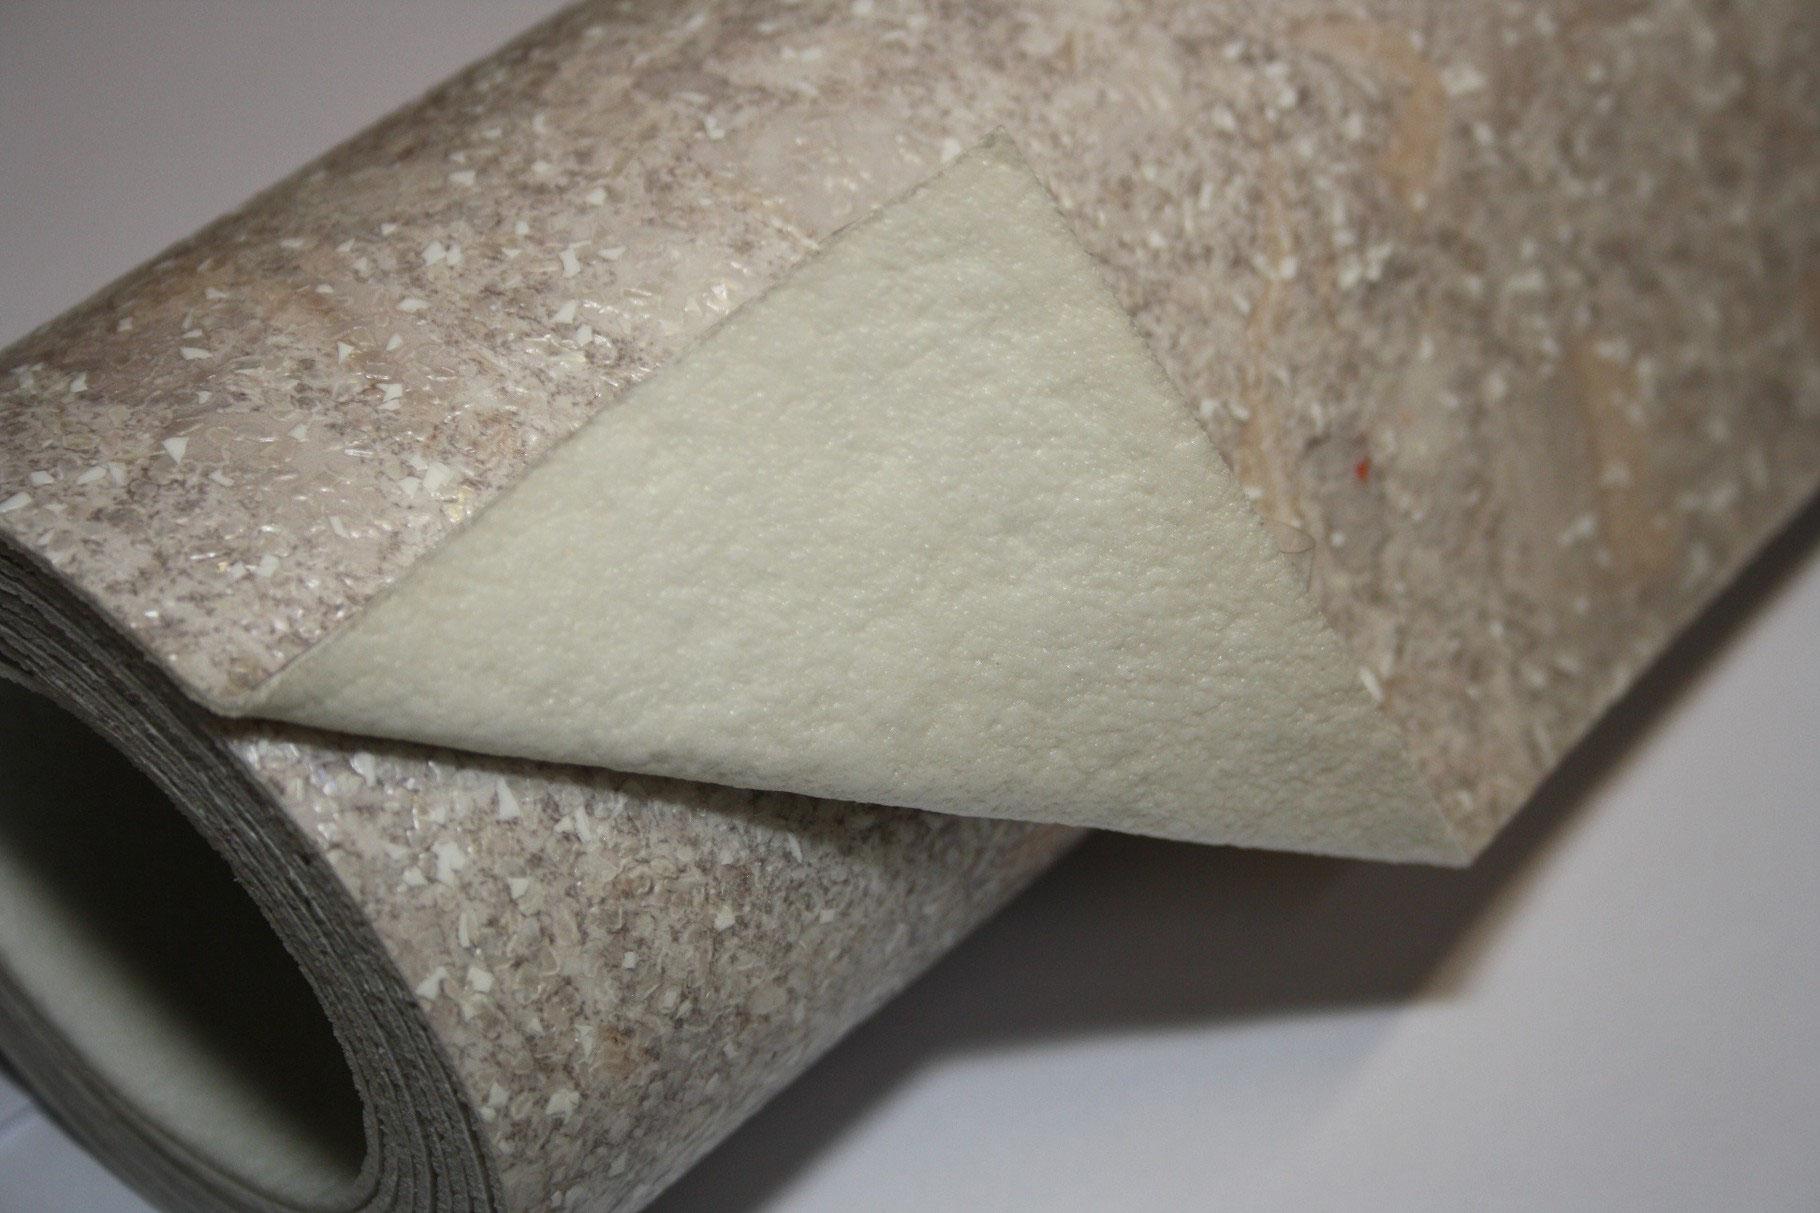 Herstellung PVC Böden - Anthuber Polsterei - Raumausstattung